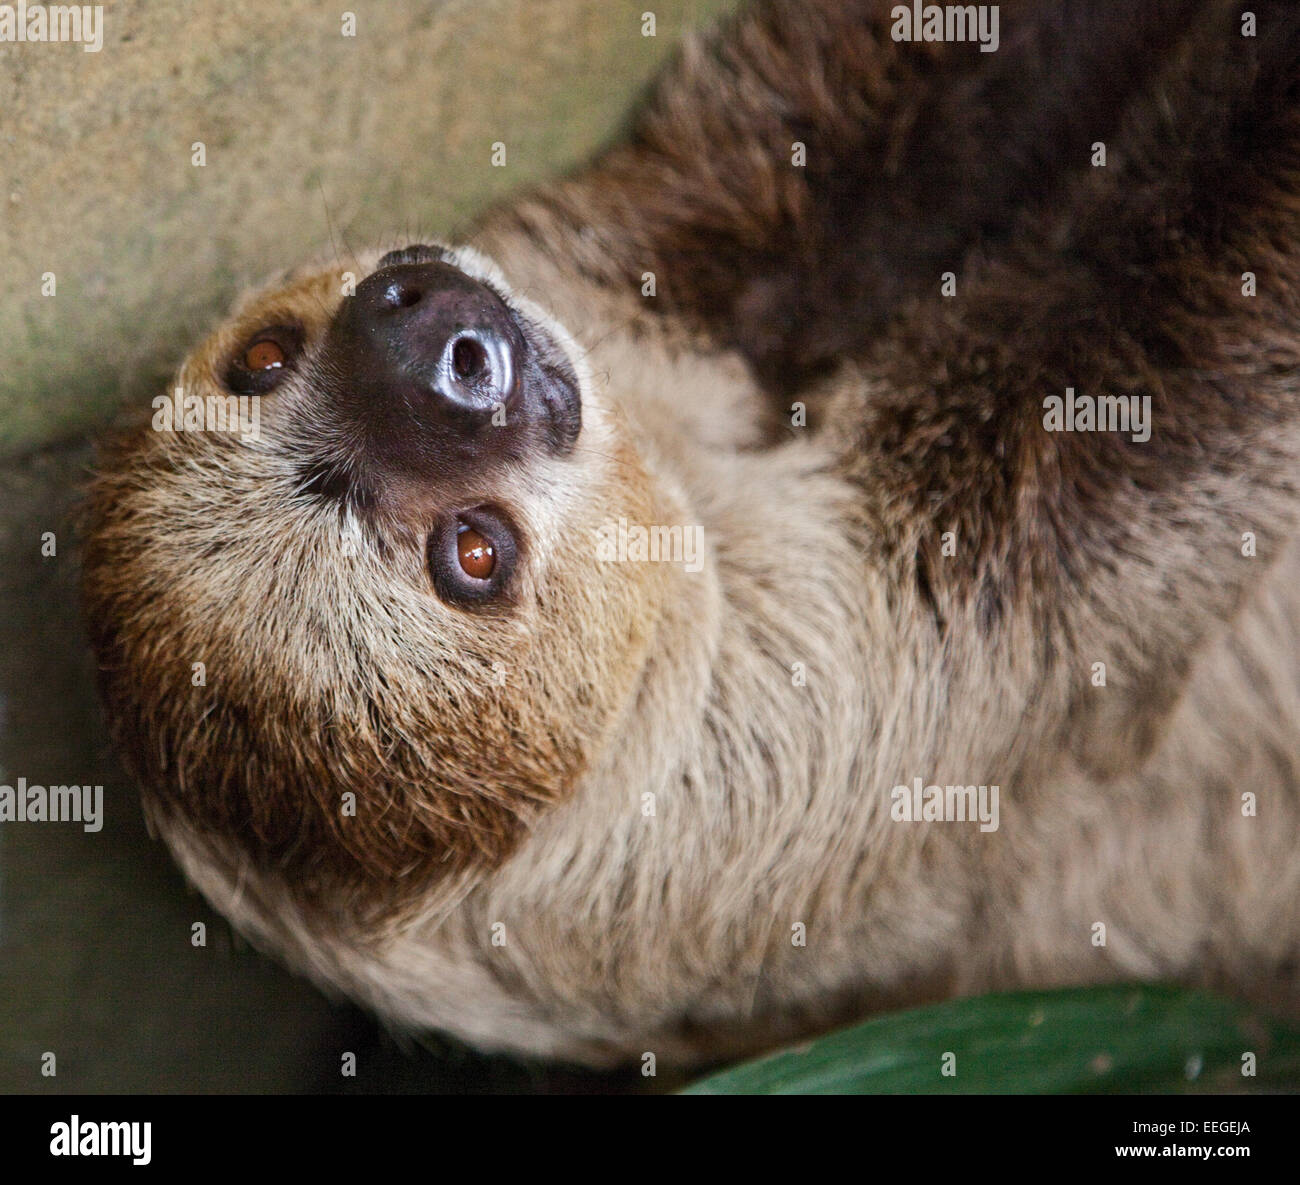 Carl von Linné zwei Toed Sloth (Choloepus Didactylus) Stockfoto